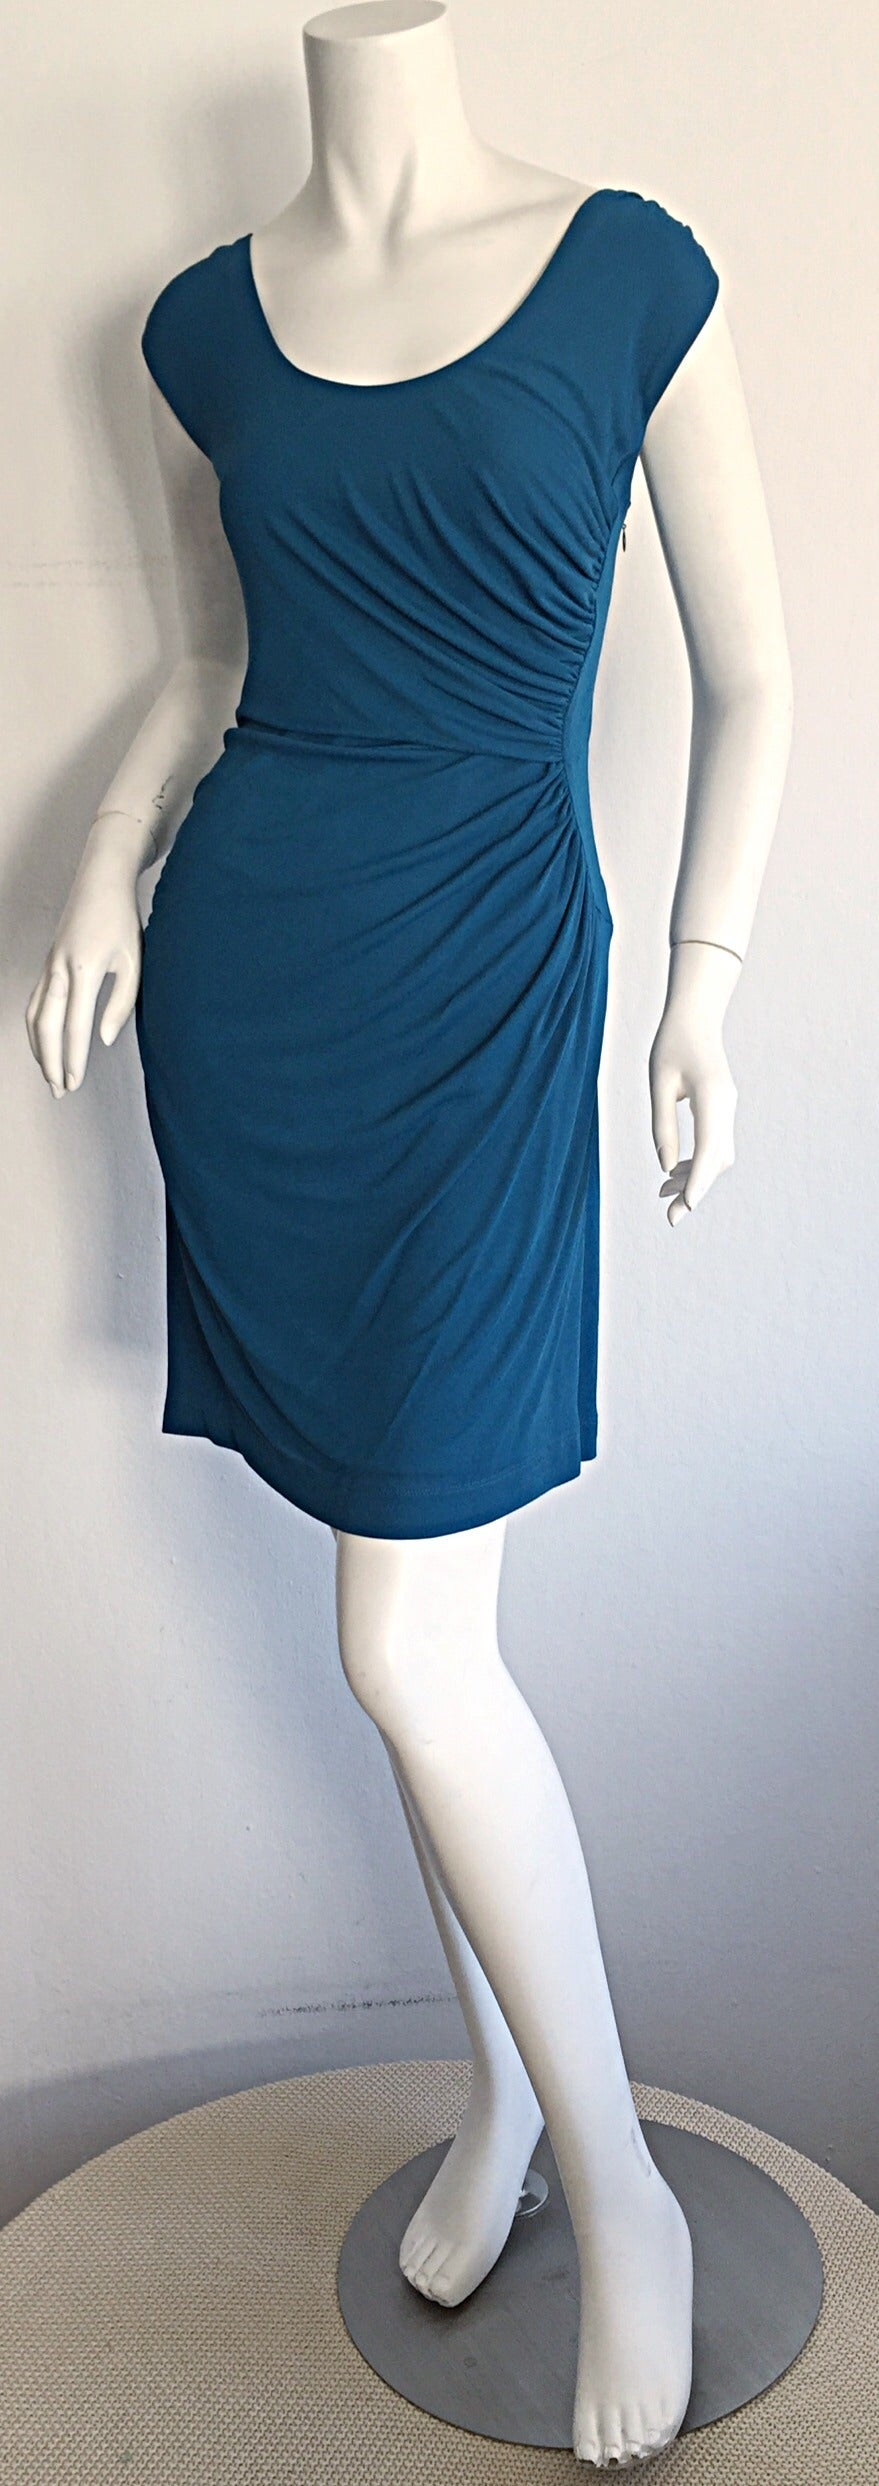 1990s Alberta Ferretti Size 6 / 8 Vintage Blue Jersey Draped Grecian Dress For Sale 2